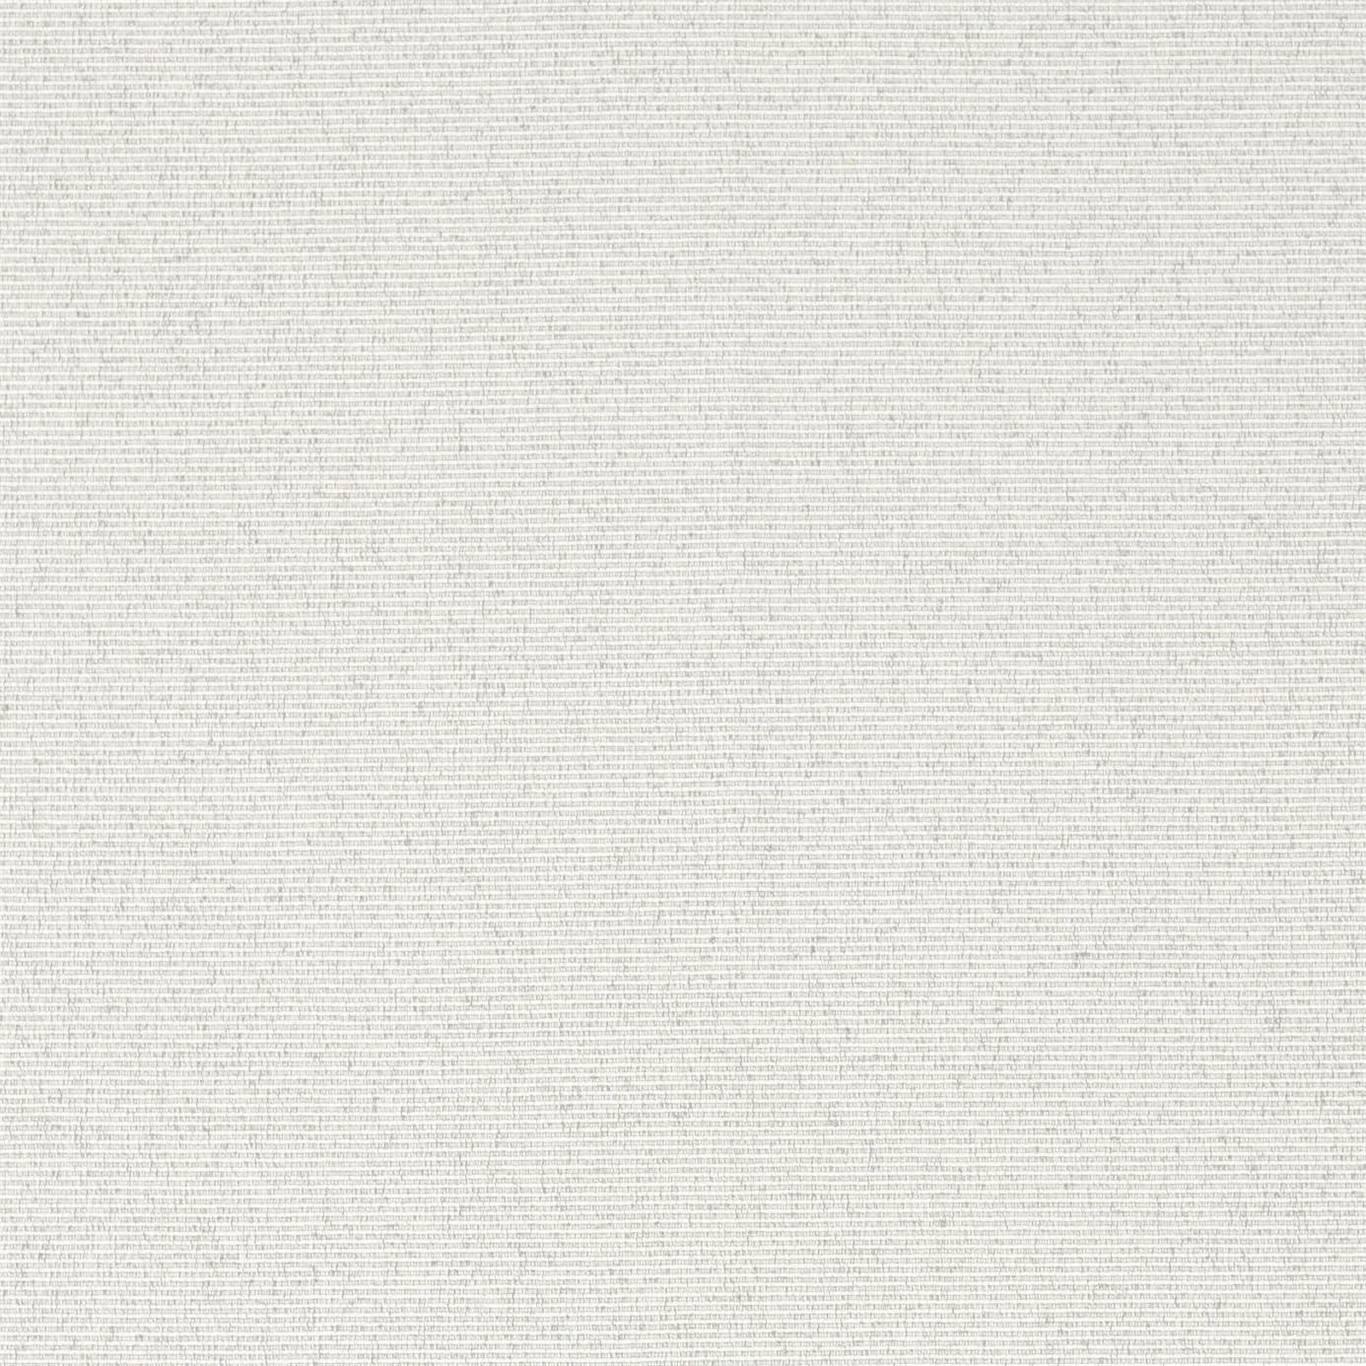 Image of Morris & Co Pure Torshavn Weave Lightish Grey Fabric 236644